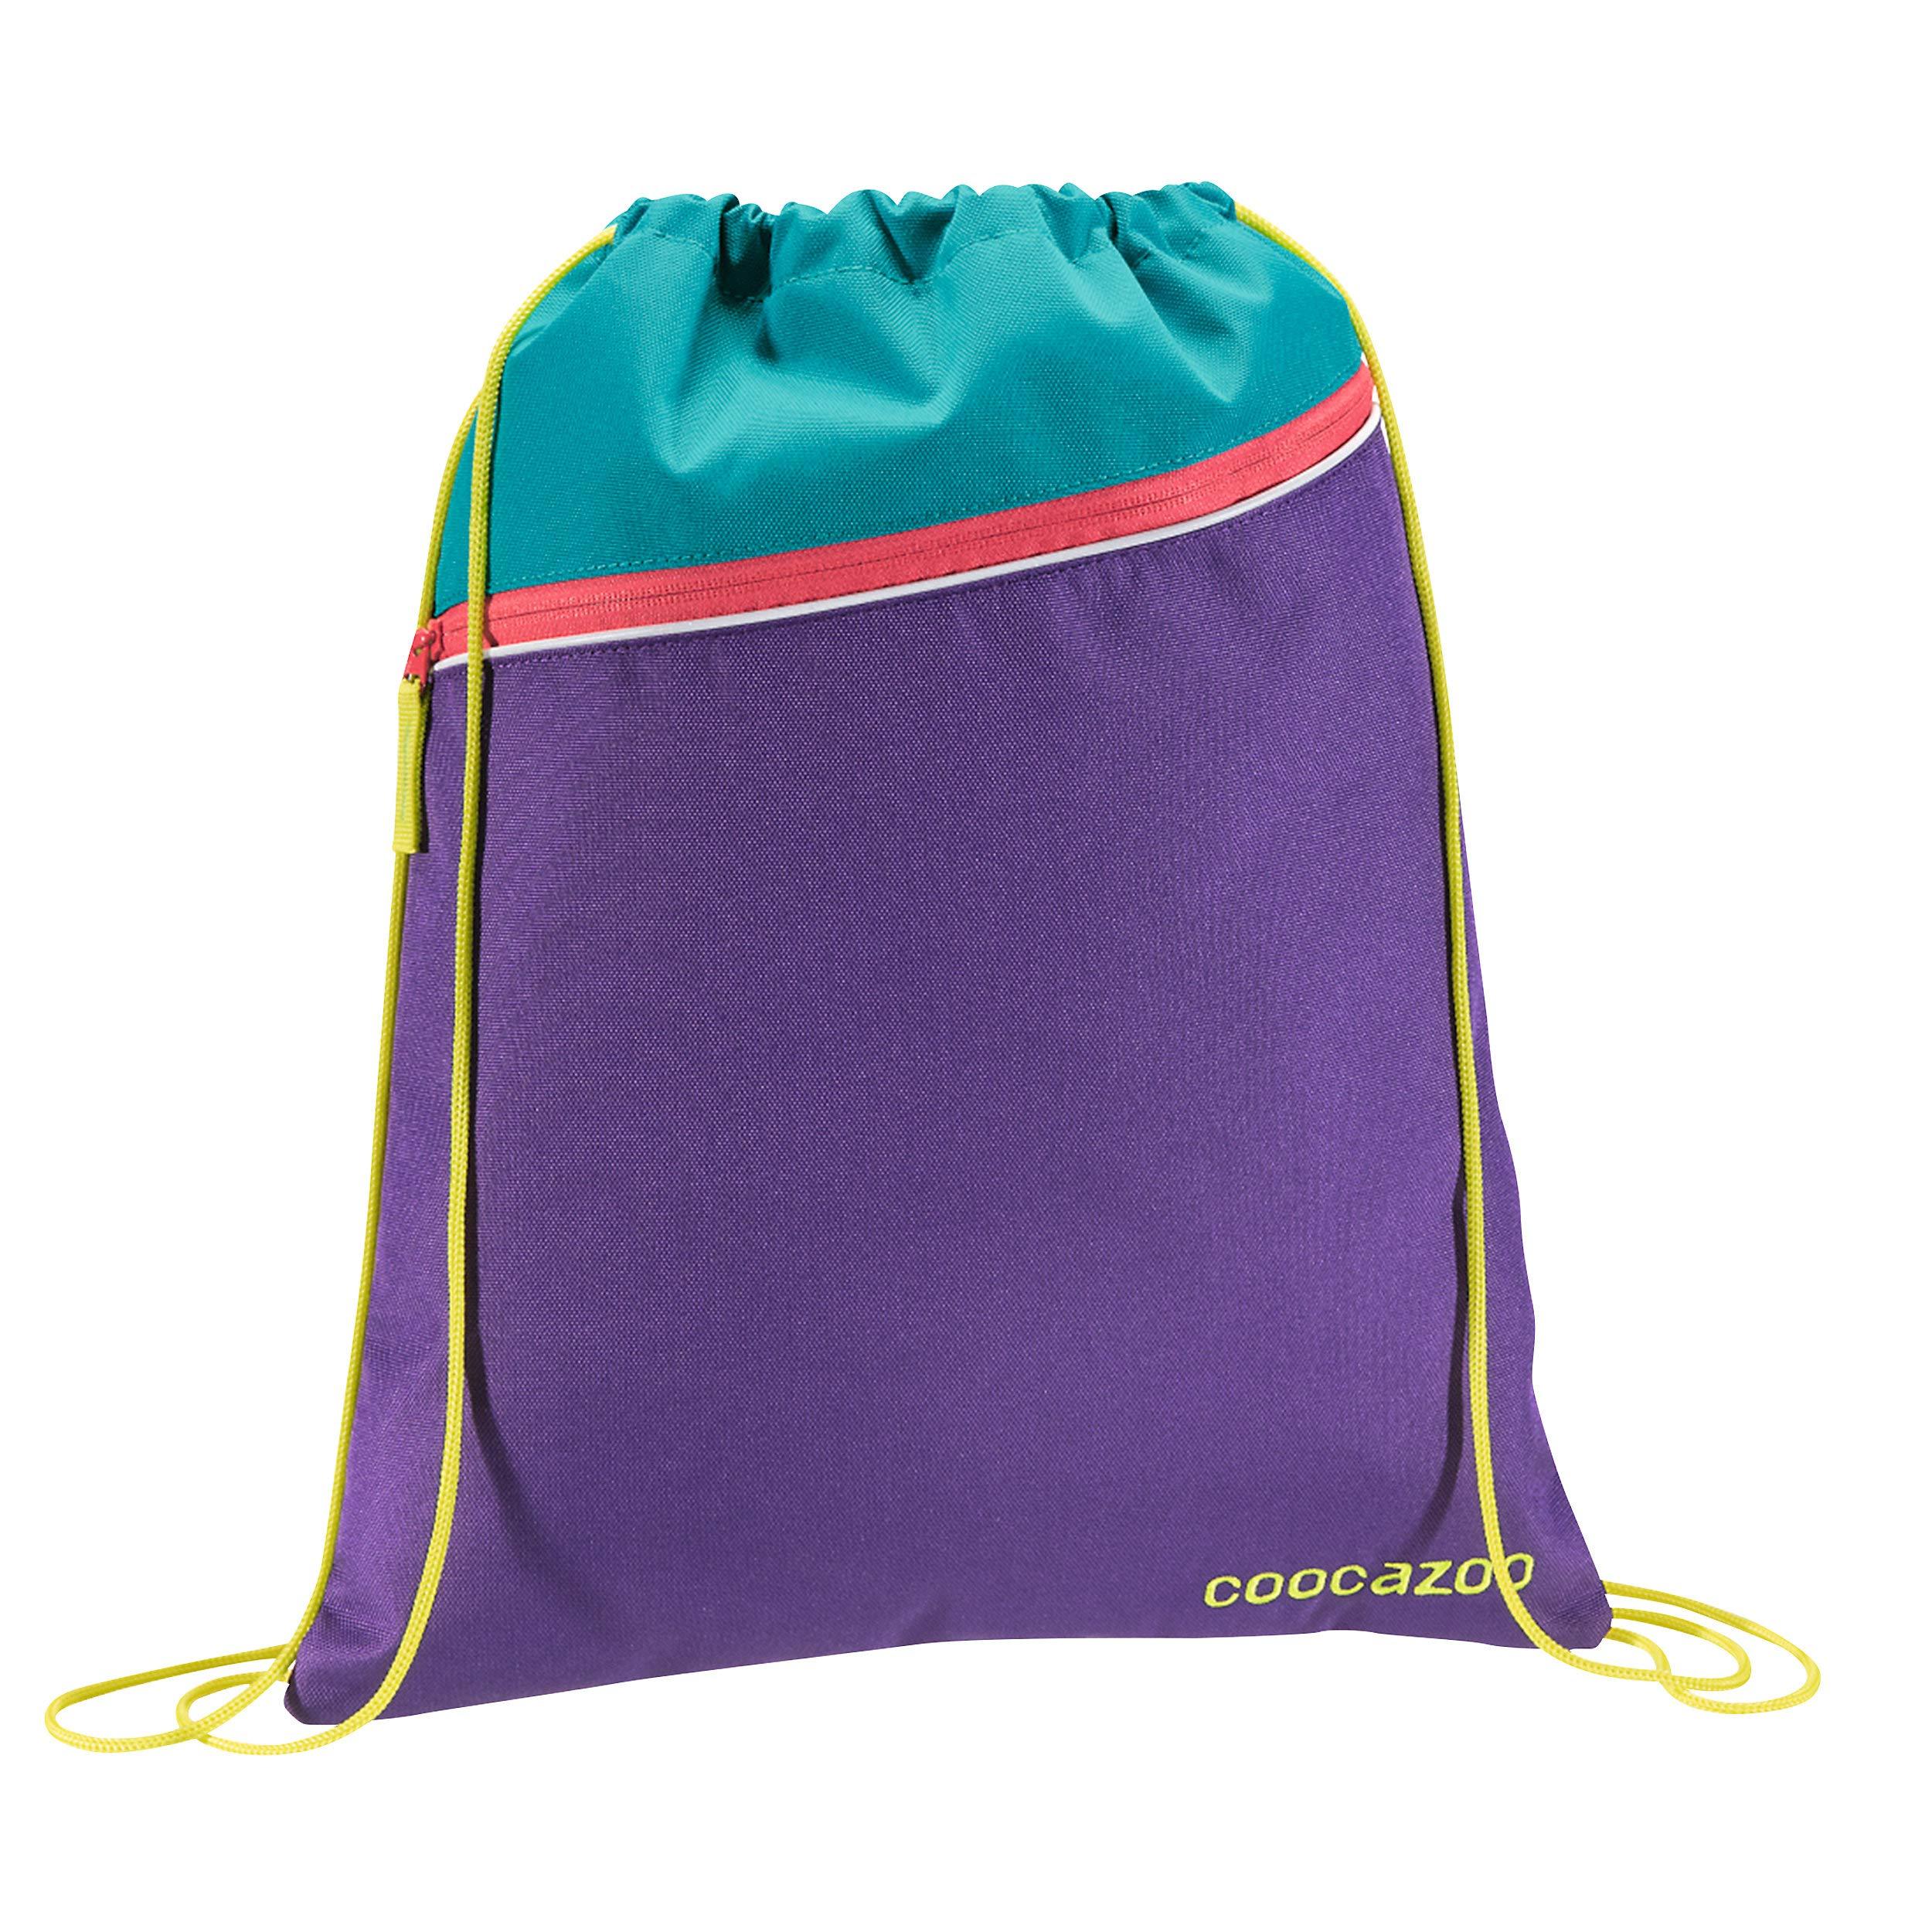 Coocazoo Sporttasche